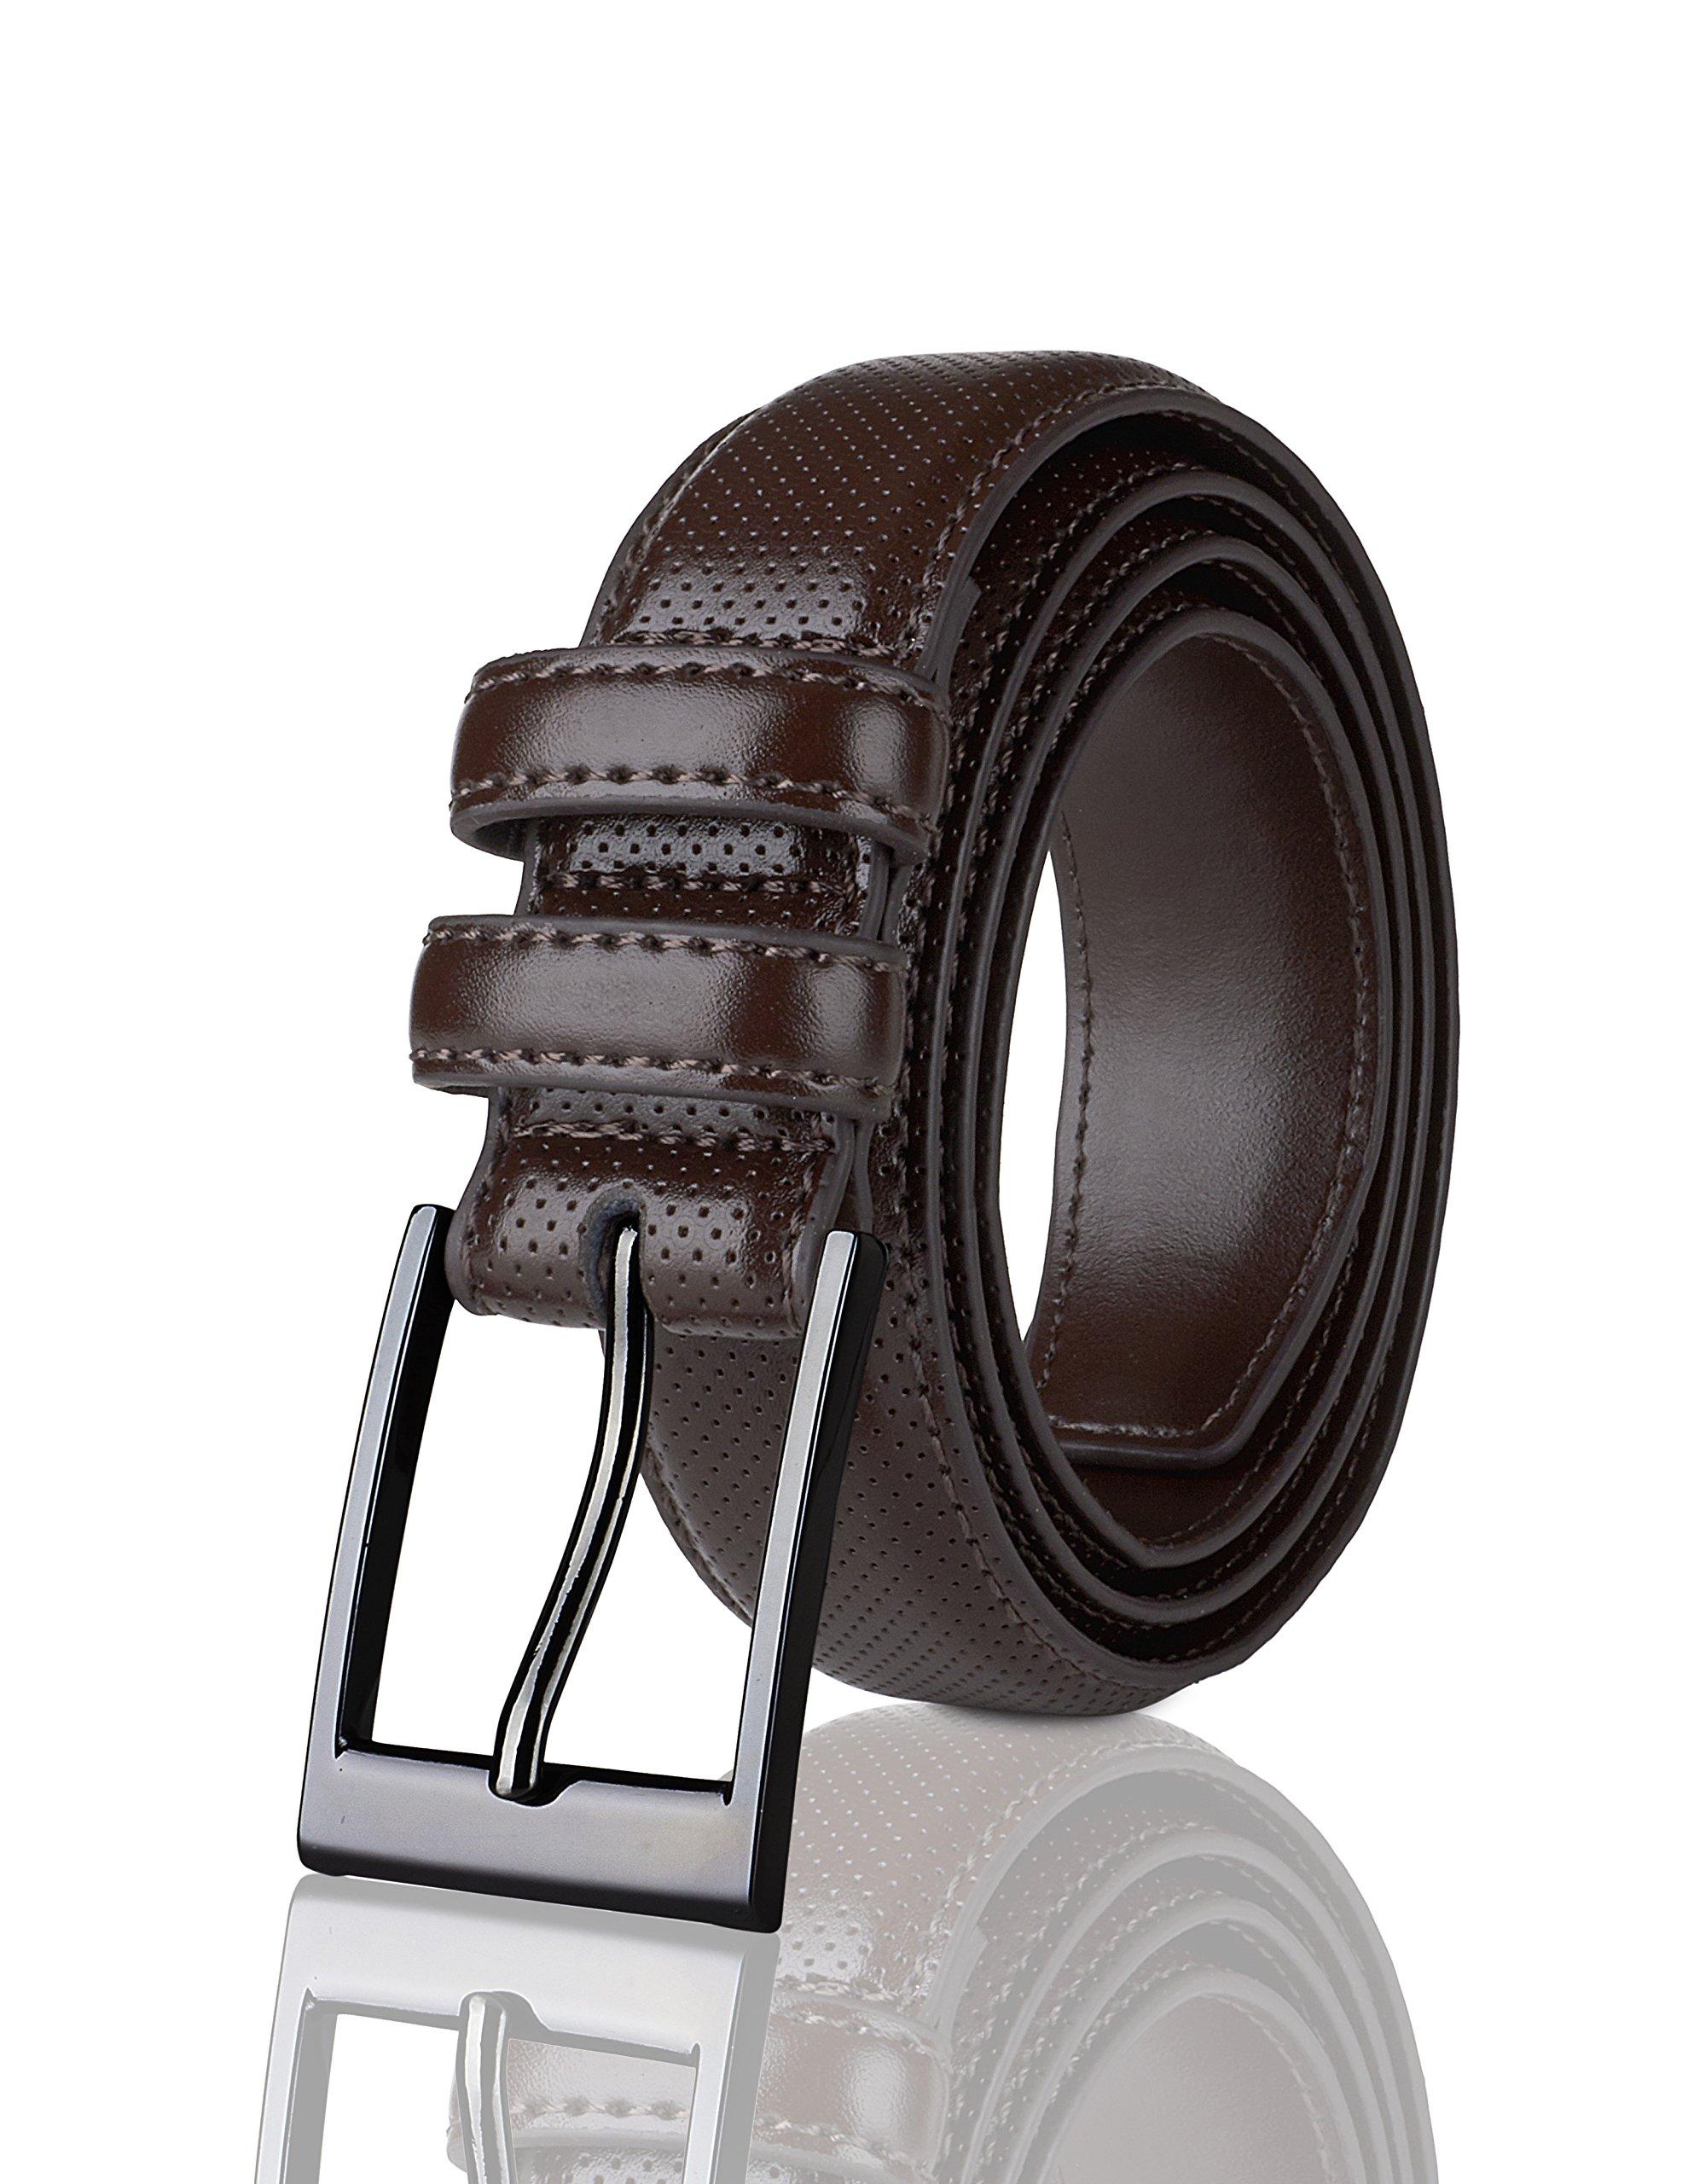 Sportoli Men's Classic Stitched Genuine Leather Uniform Dress Buckle Belt - Brown Perforated - Size 50 (Waist 48)